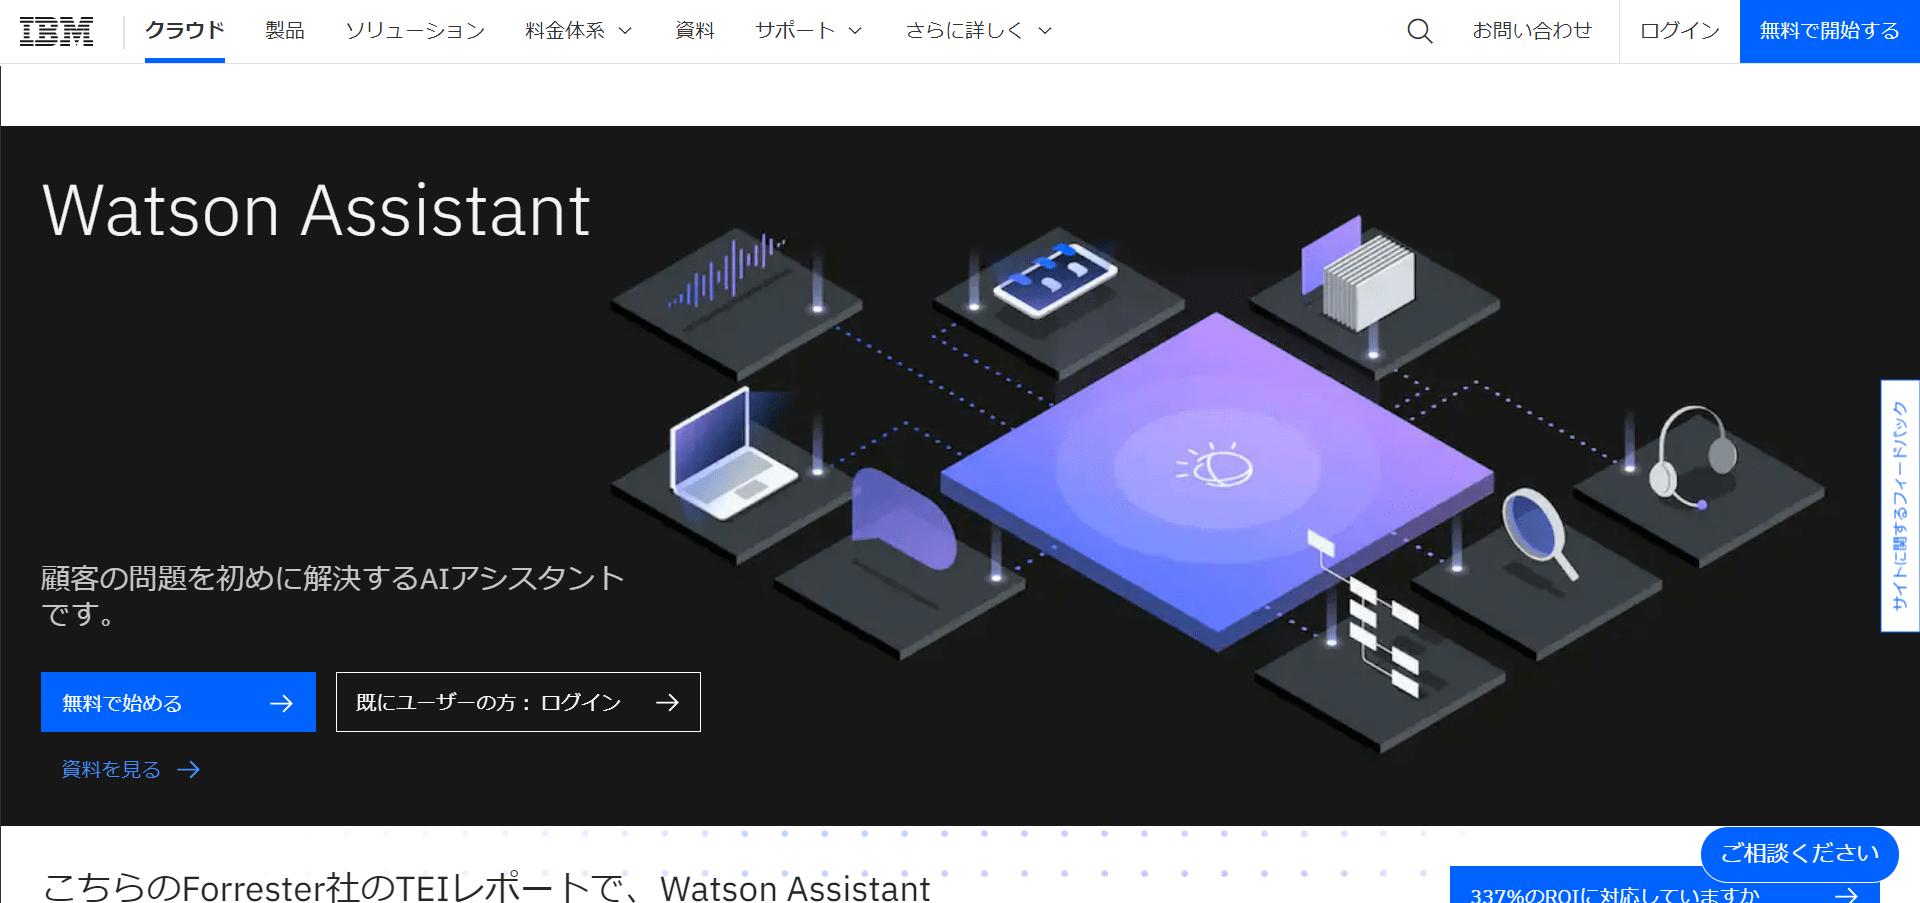 ■Watson Assistantとは?